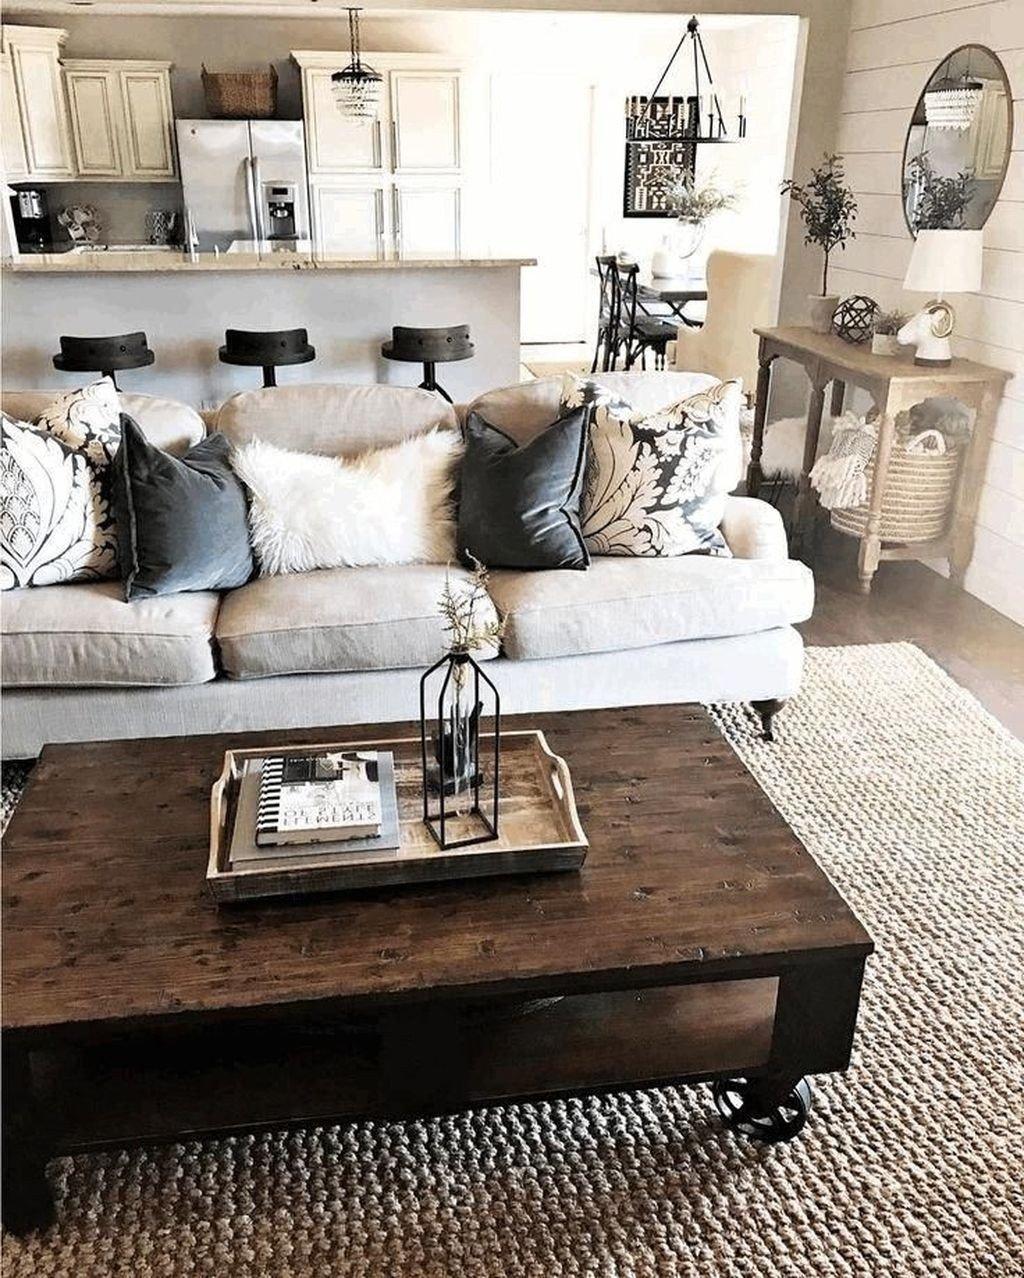 Diy Rustic Living Room Decor 40 Brilliant Diy Rustic Home Decor Ideas for Living Room